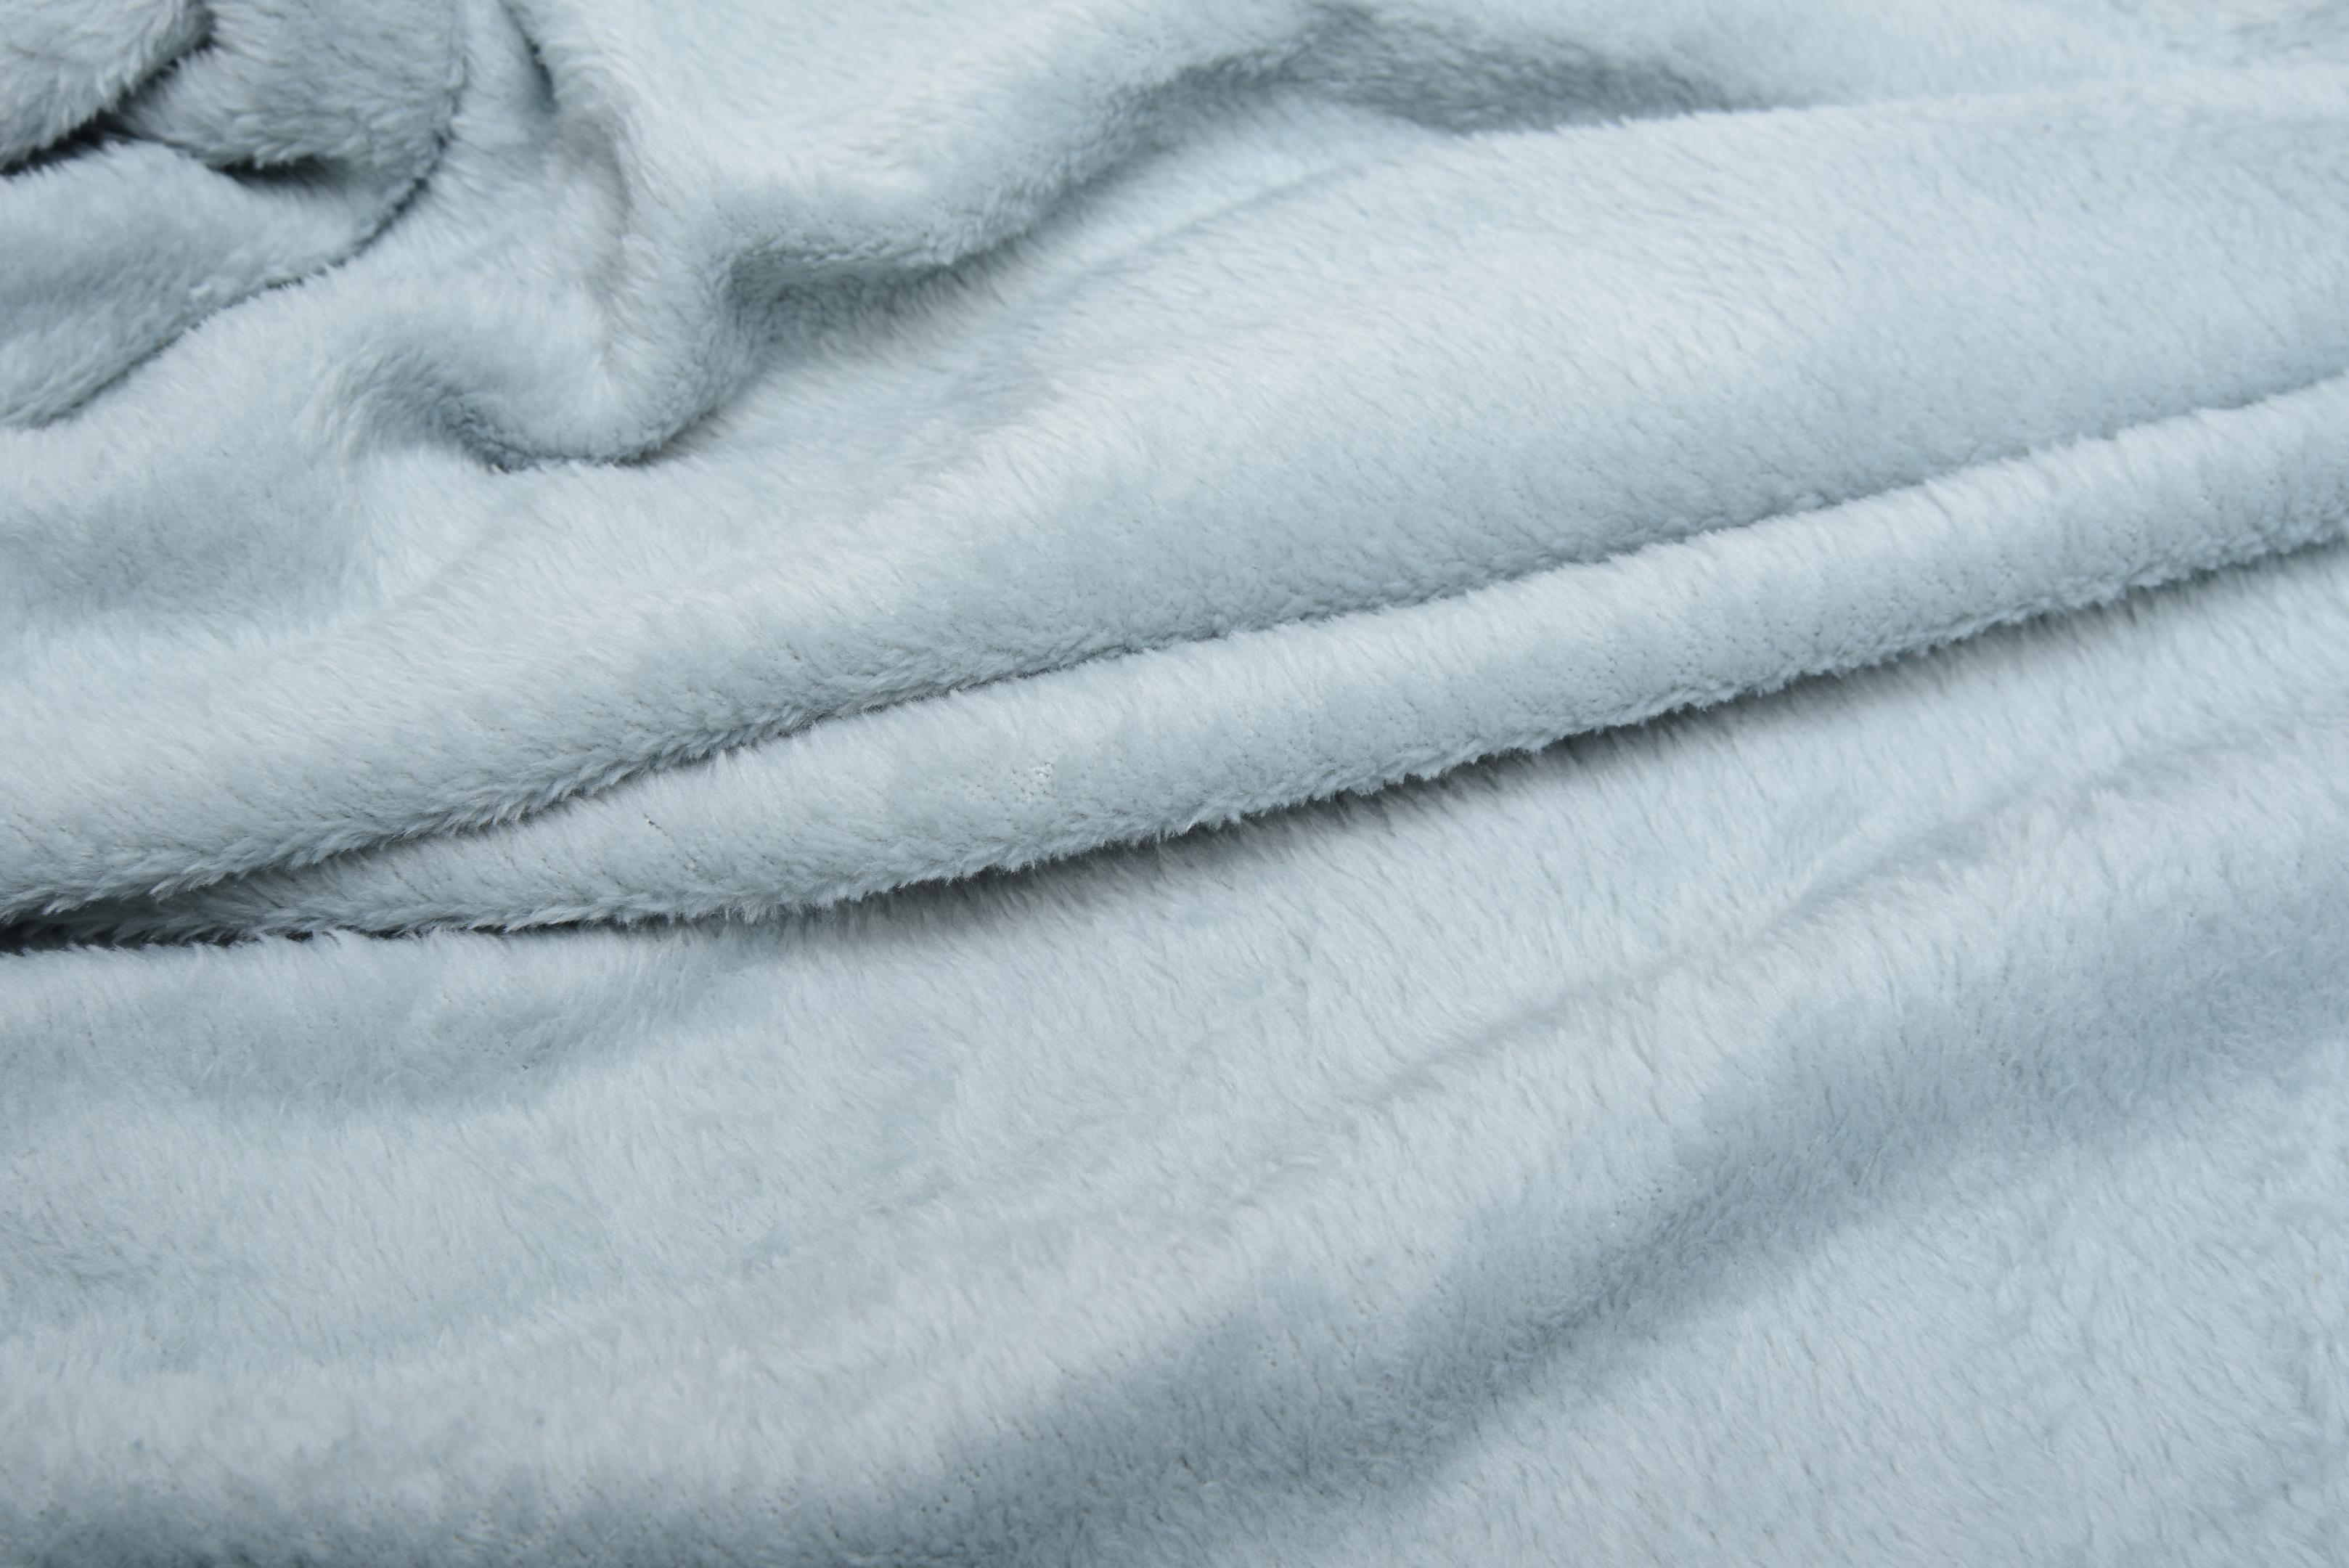 SPYDER-Insulated-Warm-Fleece-Flannel-Plush-Sheet-Set-Pillow-Case-Flat-amp-Fitted